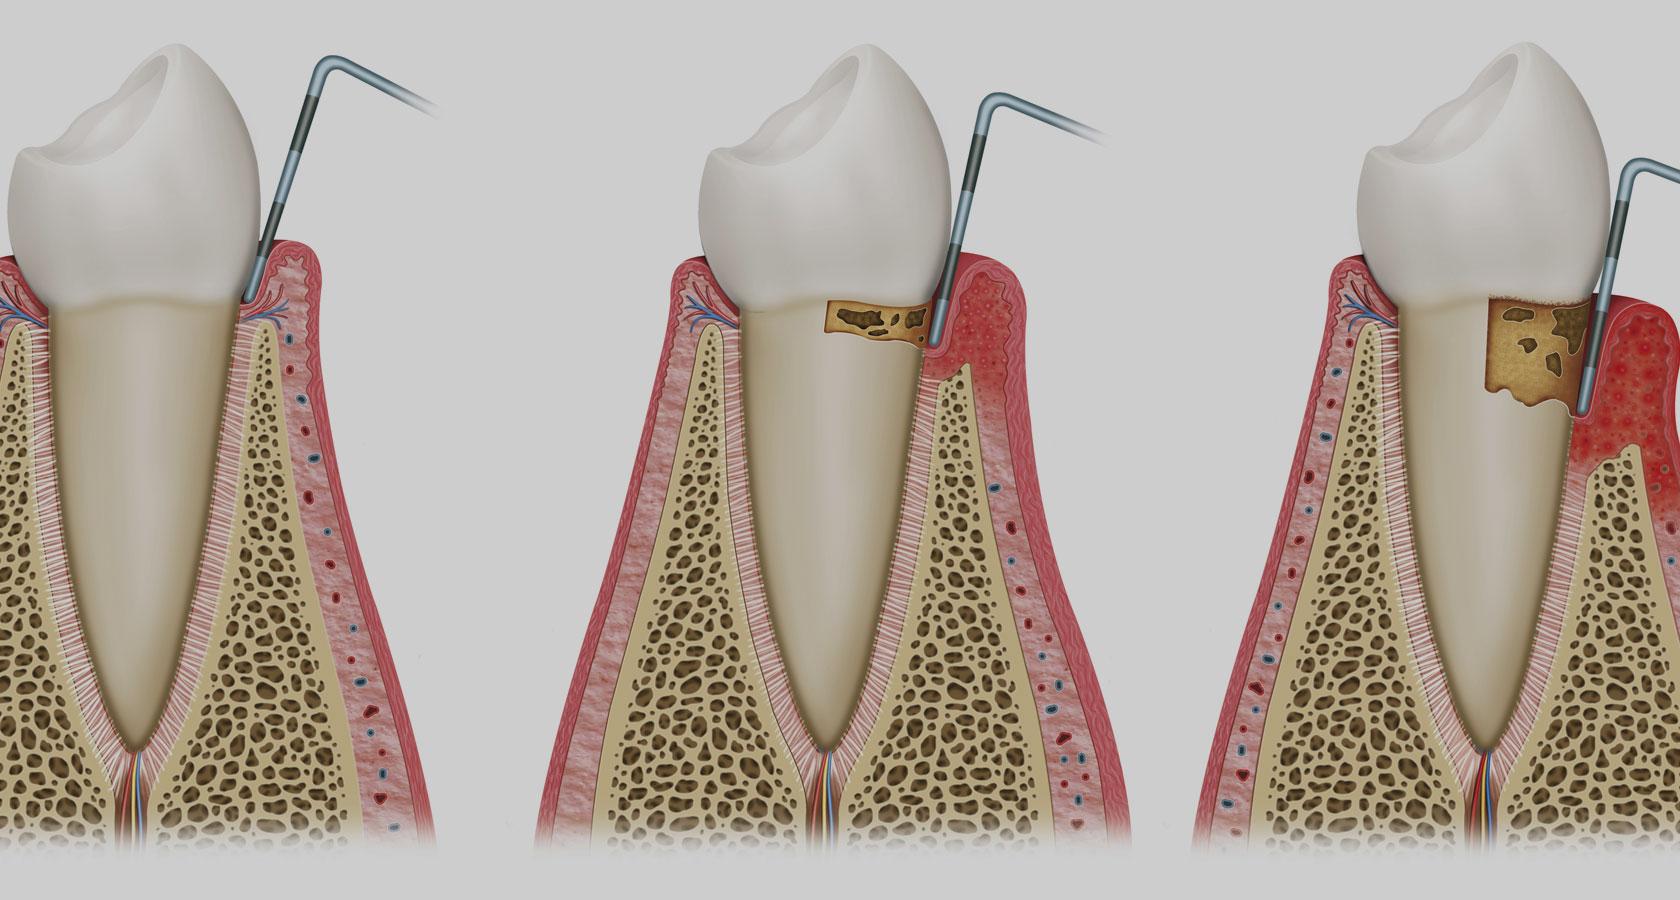 visita parodontale